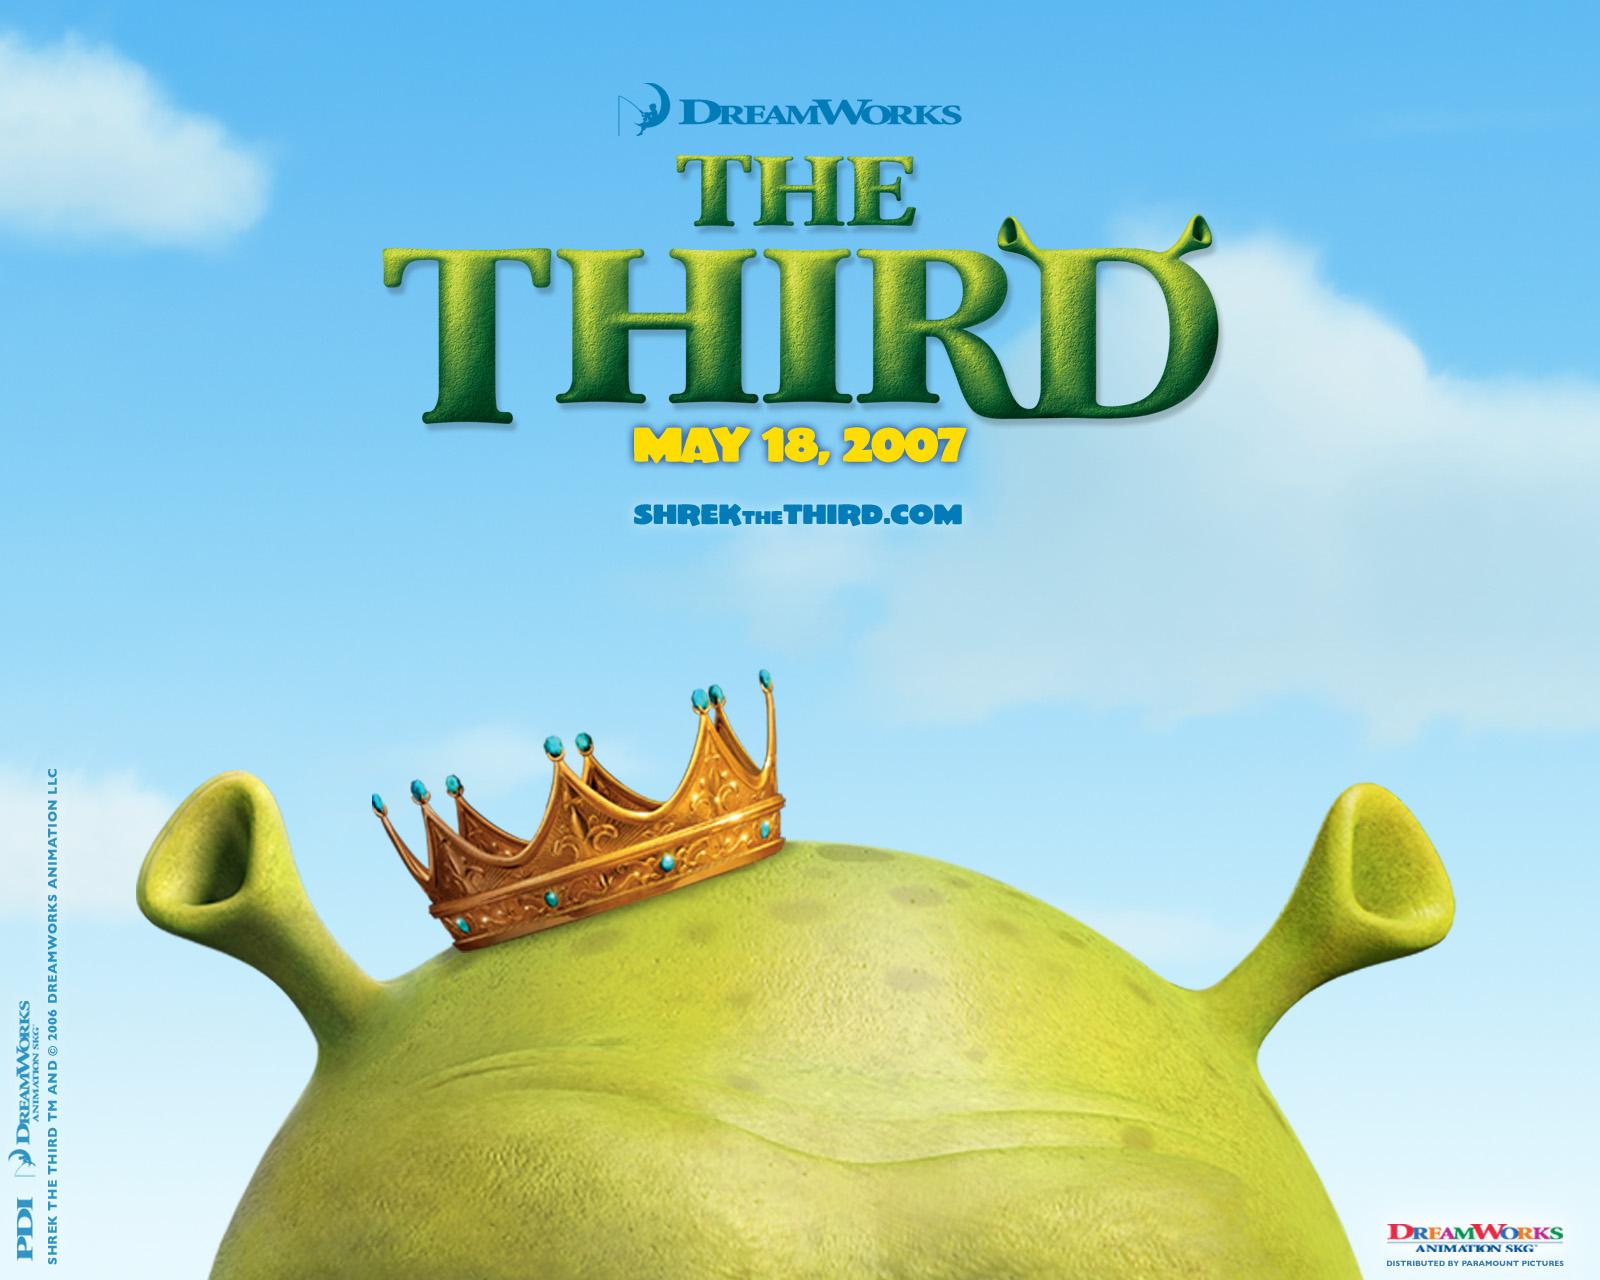 http://4.bp.blogspot.com/-7aO8aiOel6Q/UGYAbs9c2VI/AAAAAAAAOpk/sqzoh_11Ap8/s1600/Shrek_the_Third_Wallpaper_5_1280.jpg